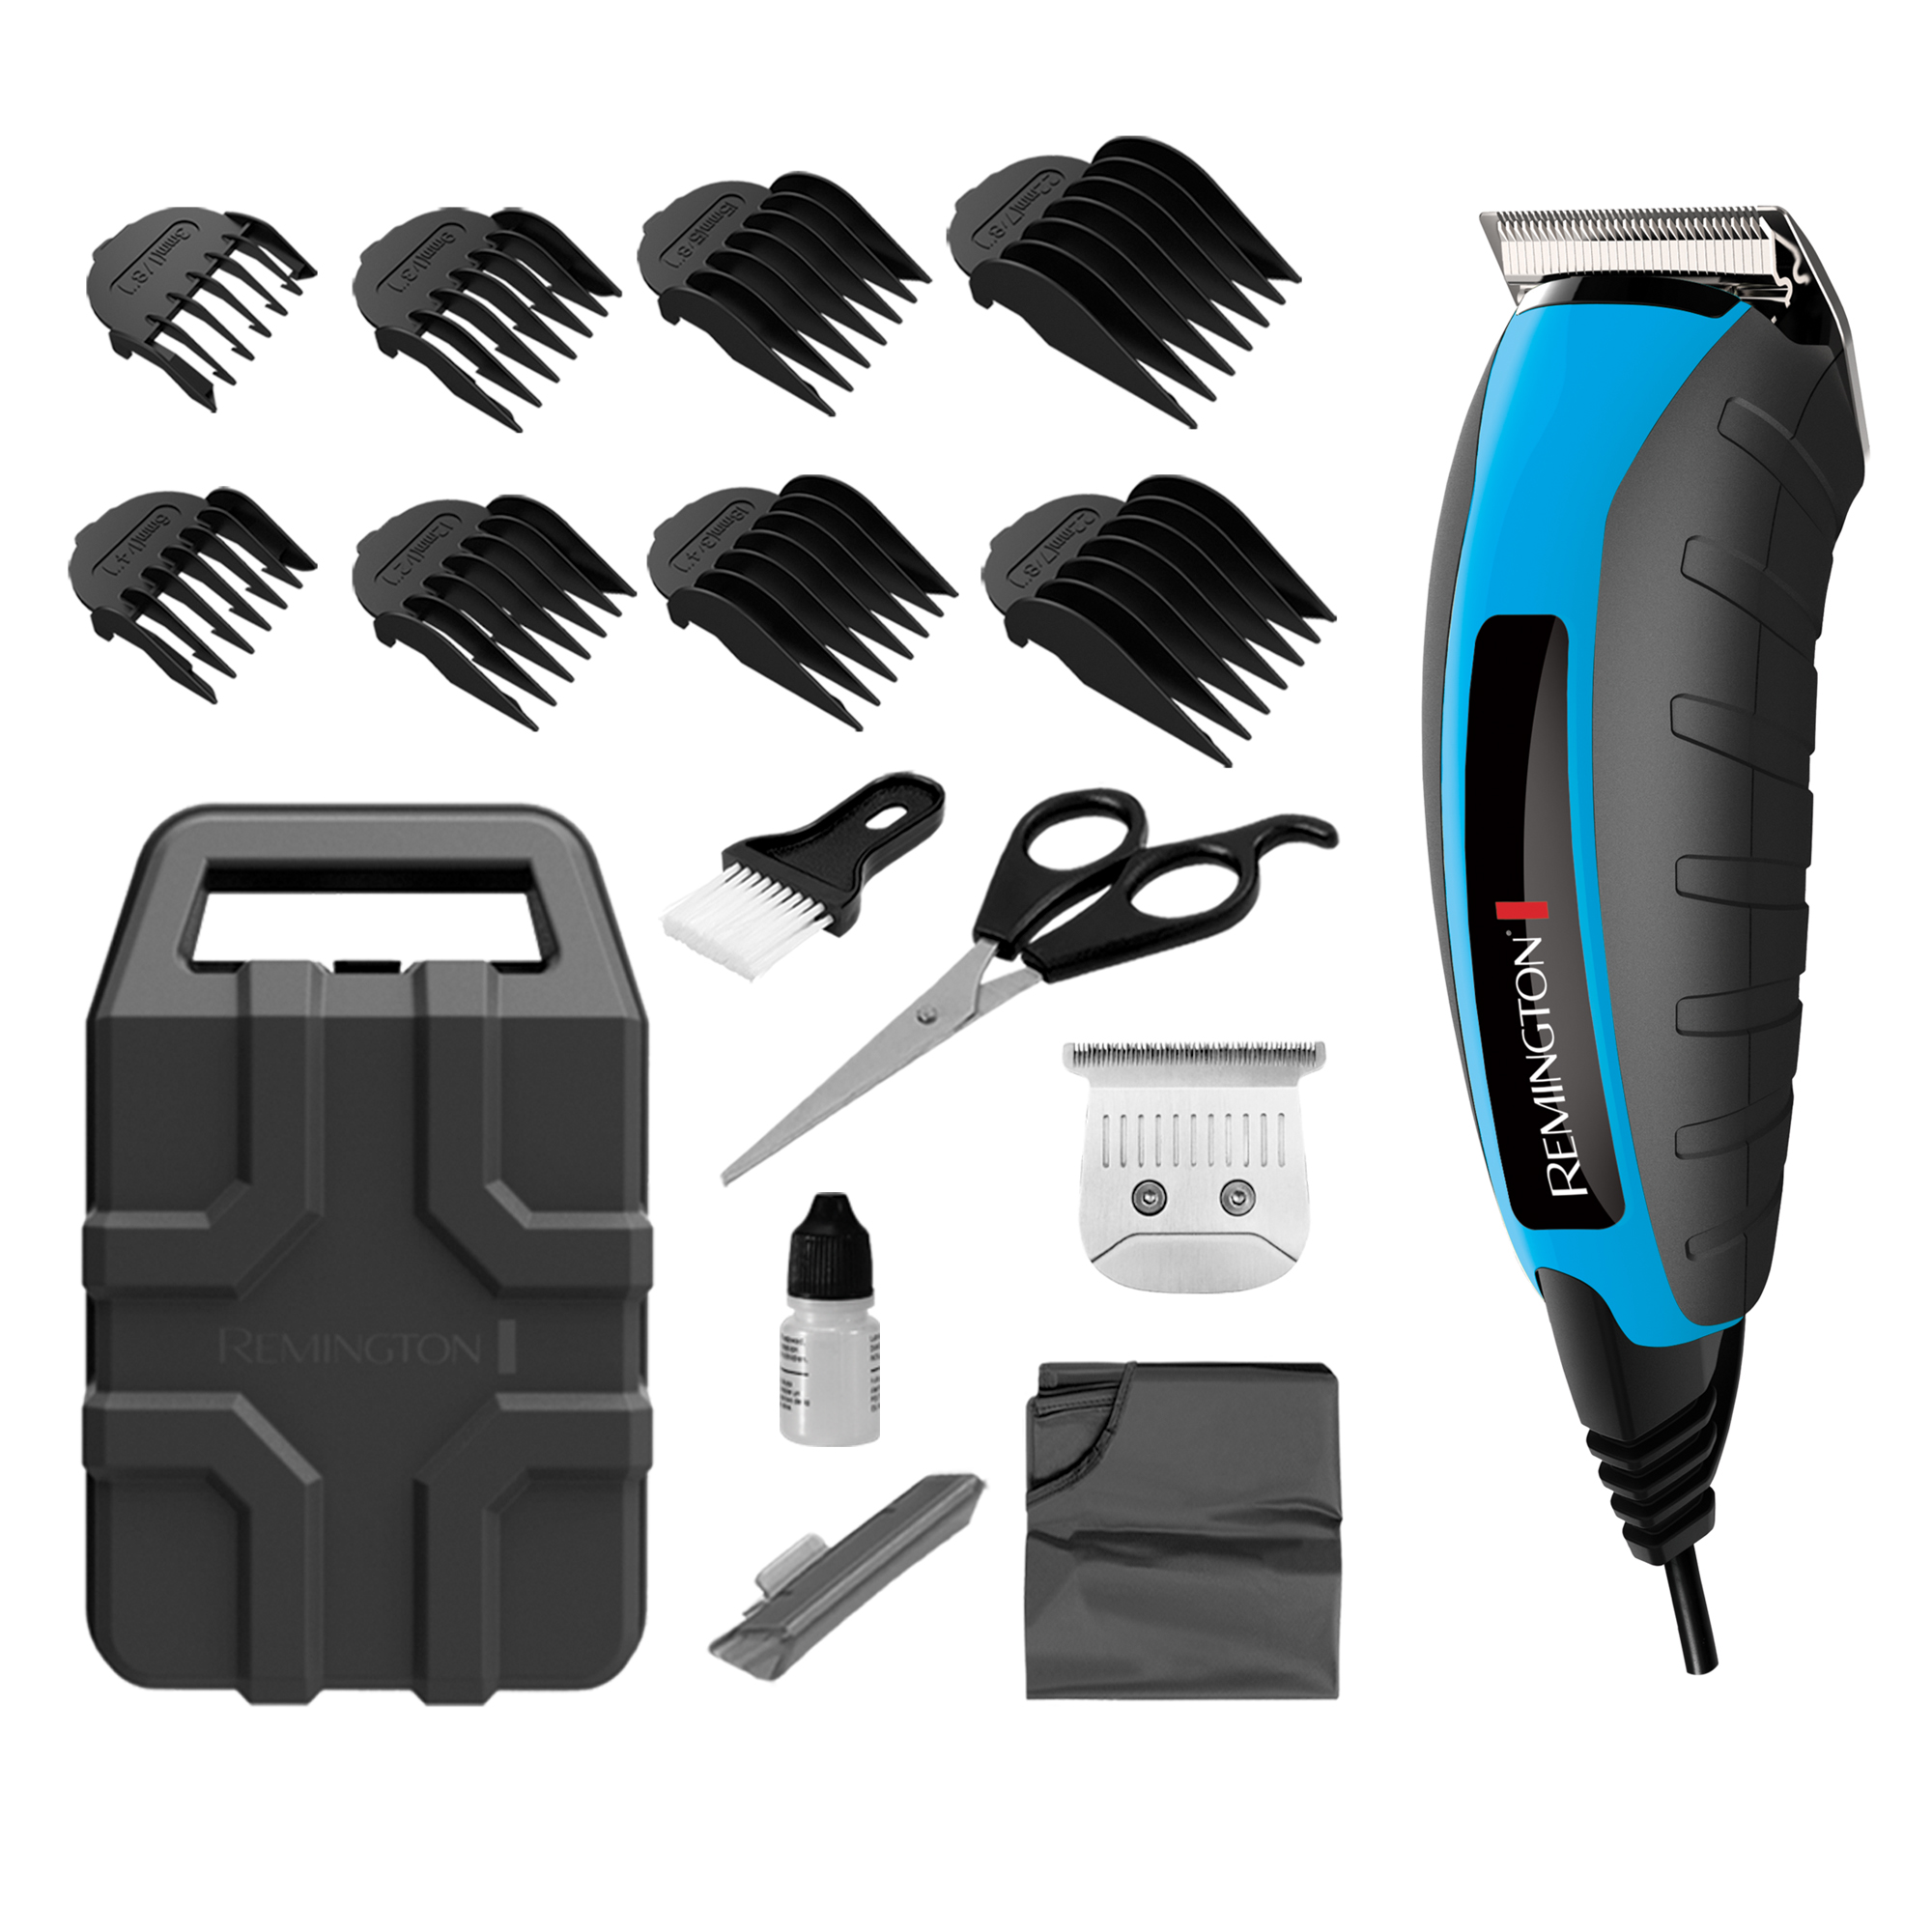 Remington Virtually Indestructible Barbershop Hair Clipper 15-piece Kit, Blue/Black, HC5850A